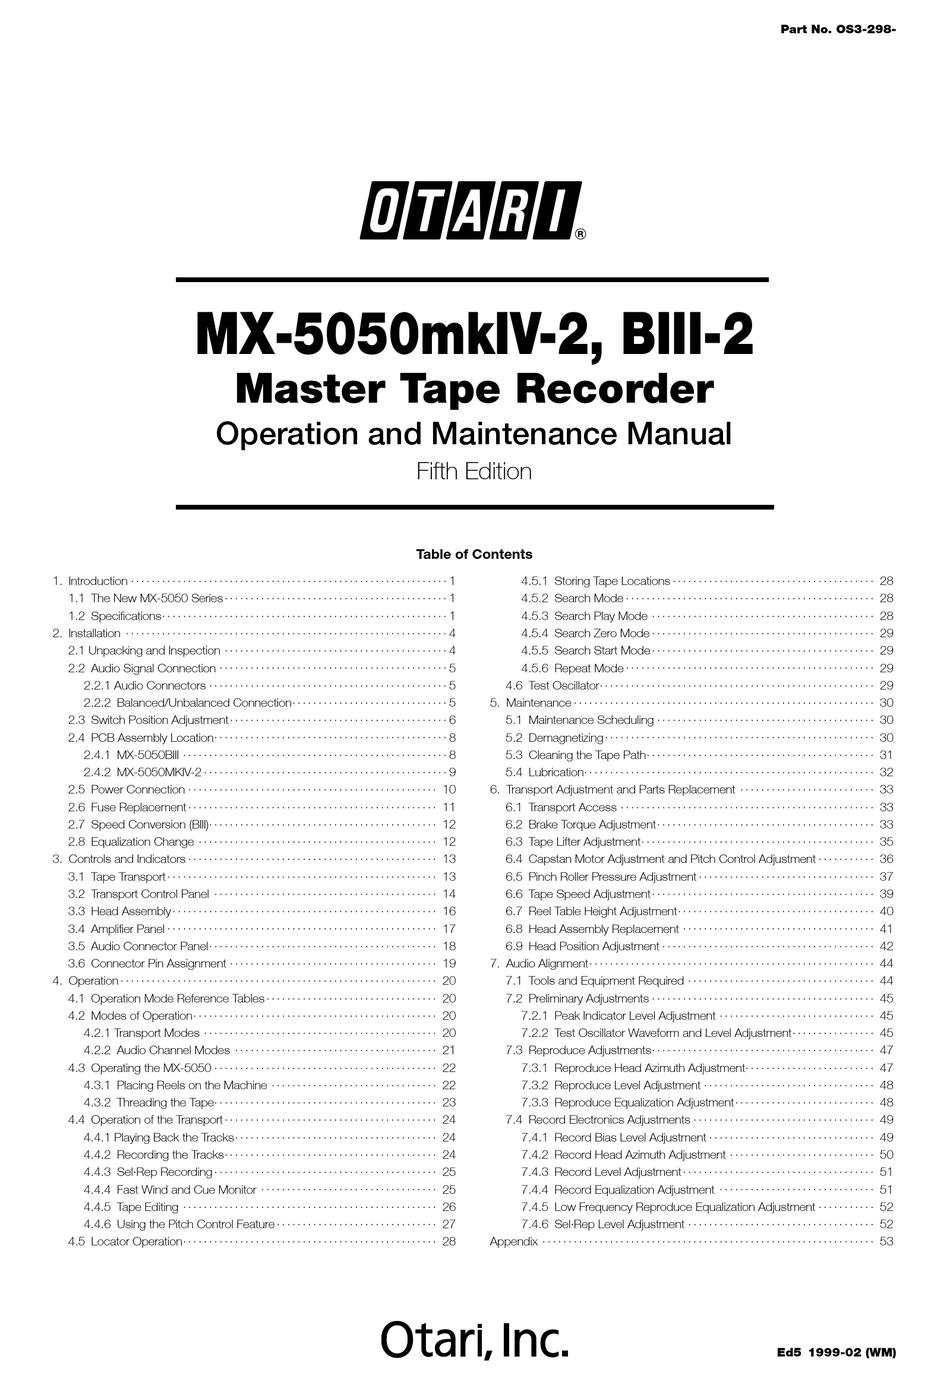 OTARI MX-5050MKIV-2 OPERATION AND MAINTENANCE MANUAL Pdf